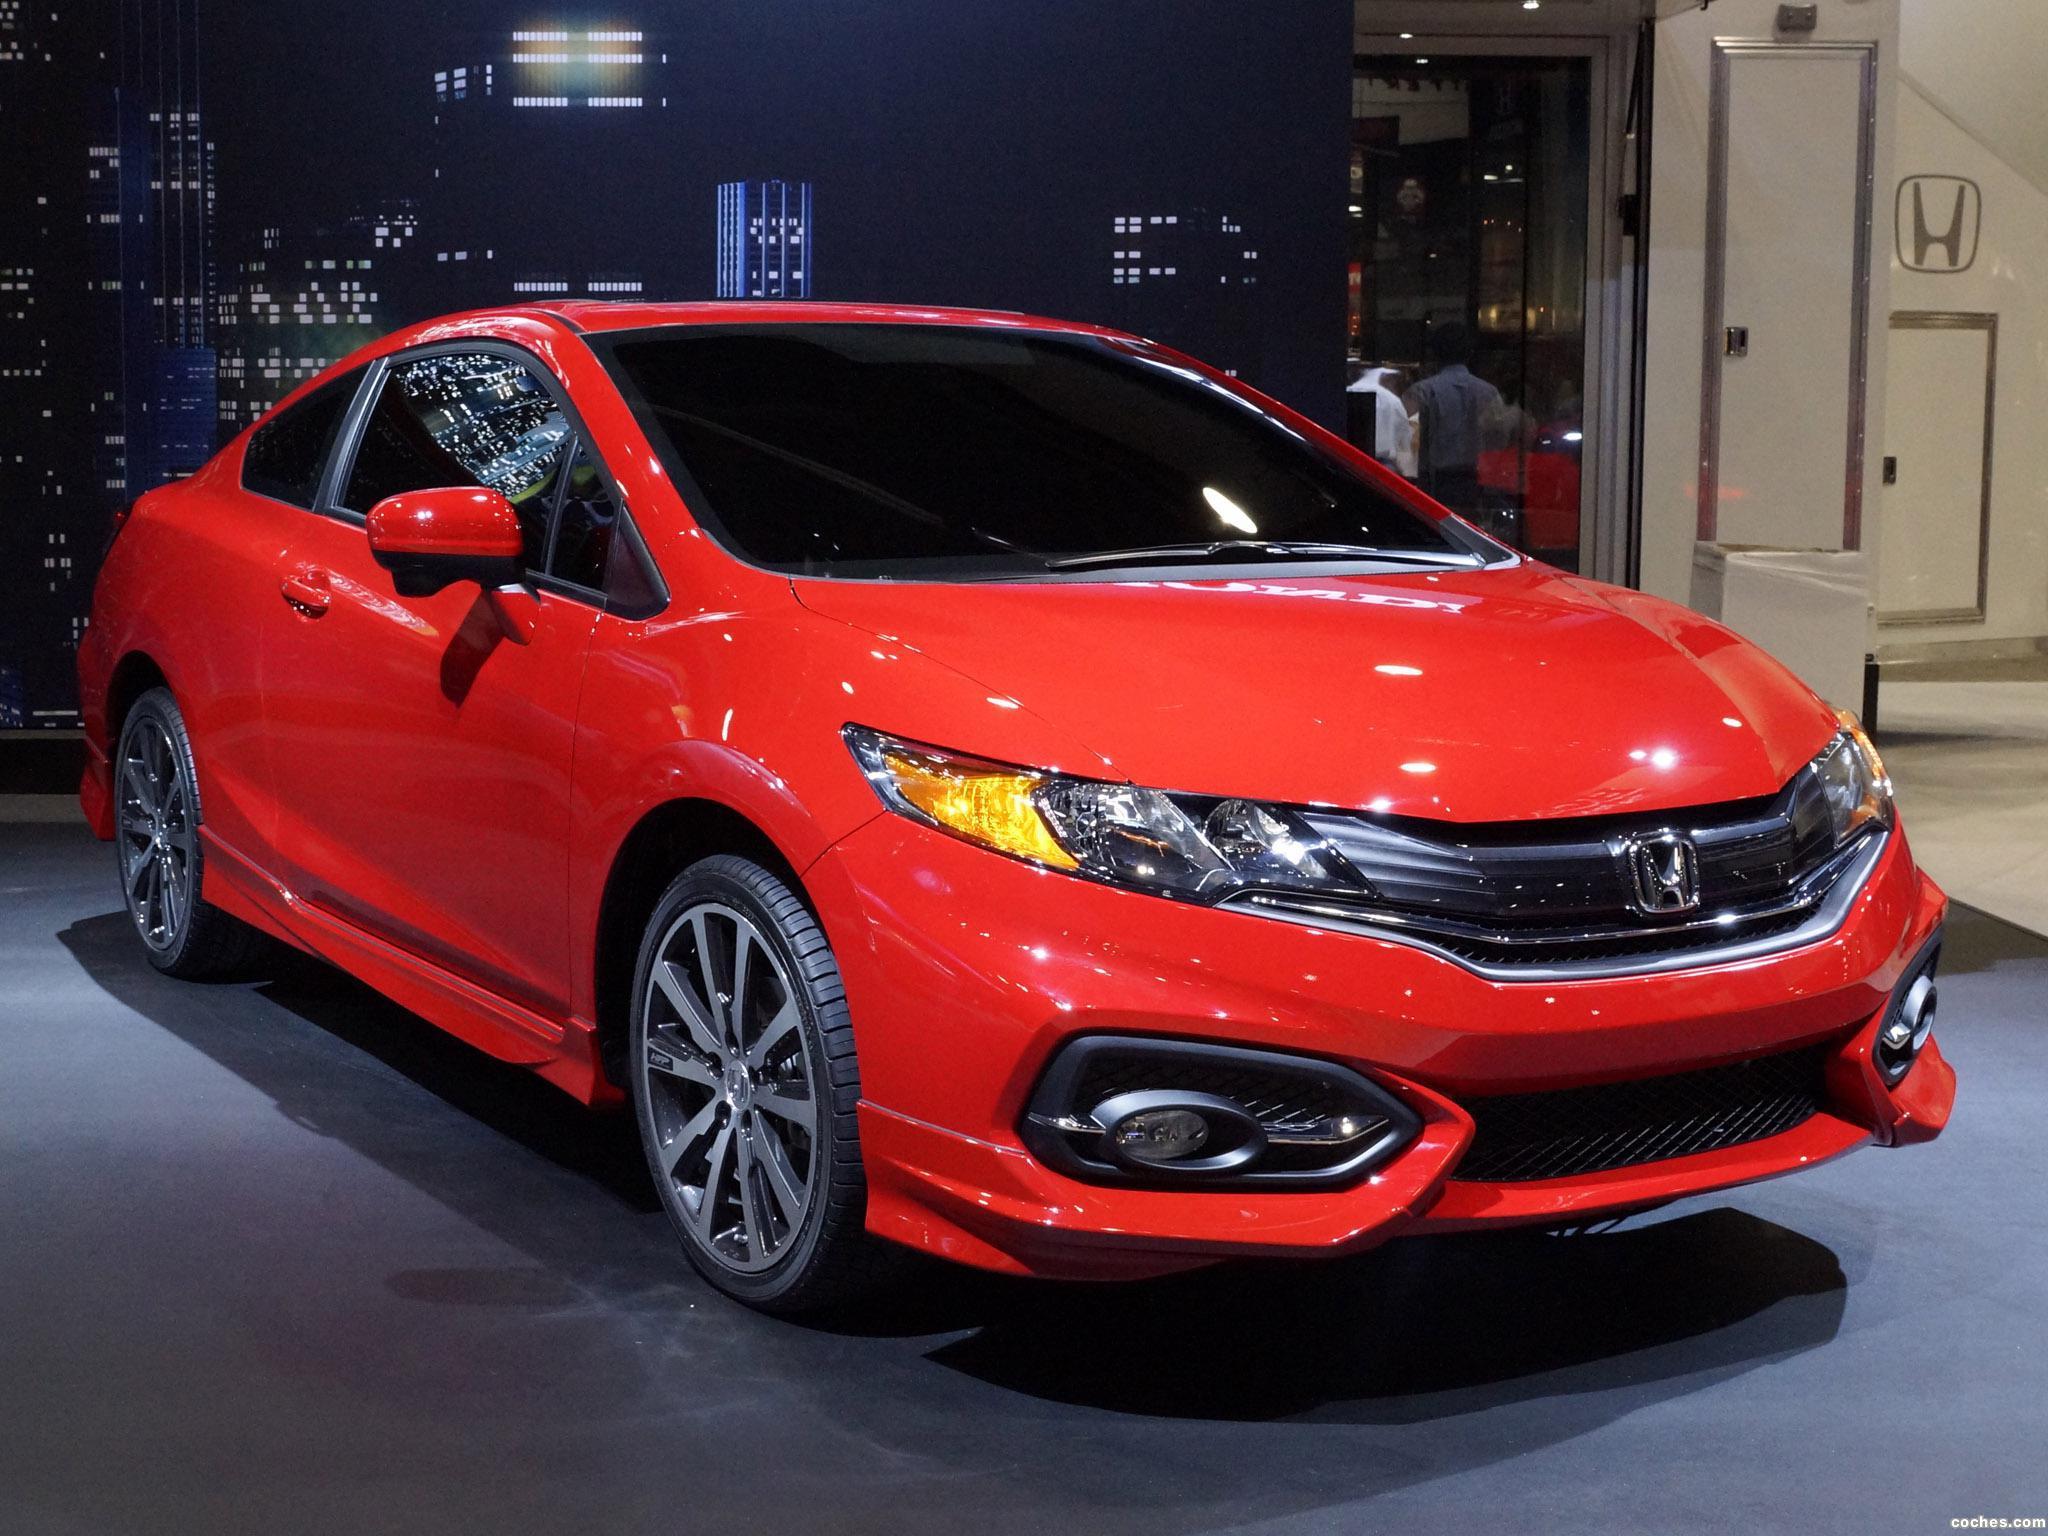 Fotos De Honda Civic Coupe 2014